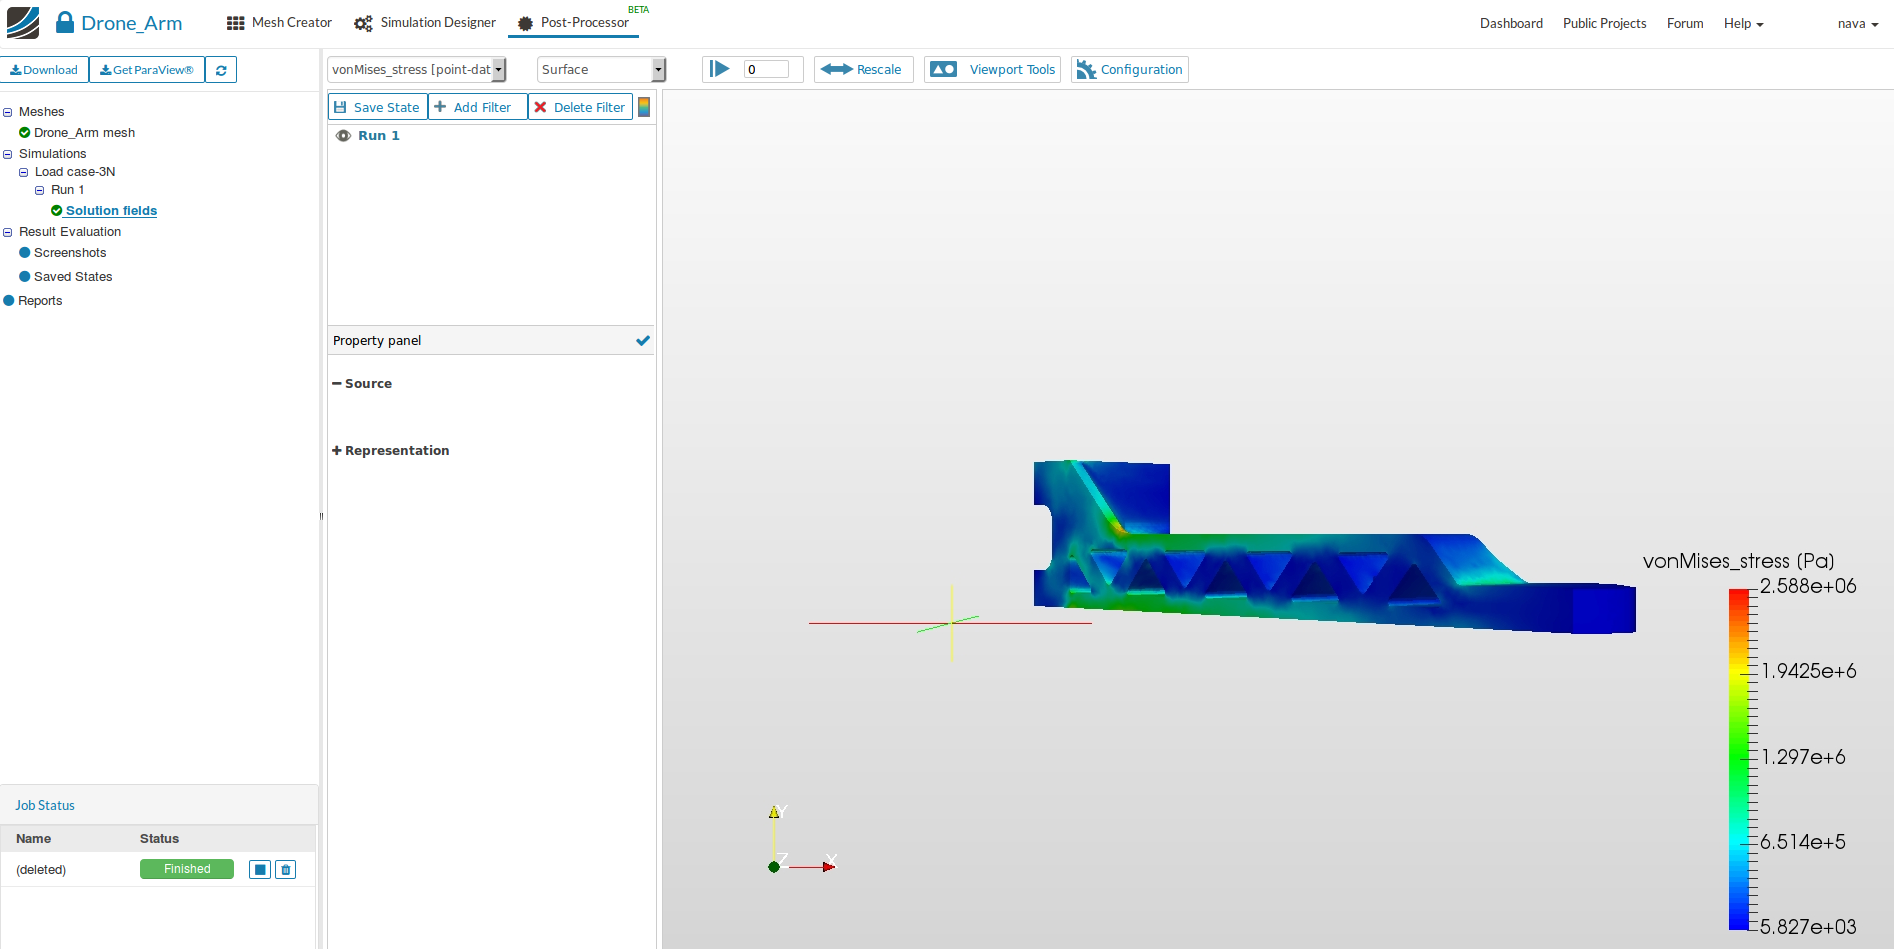 diy drone design, simulation results postprocessing